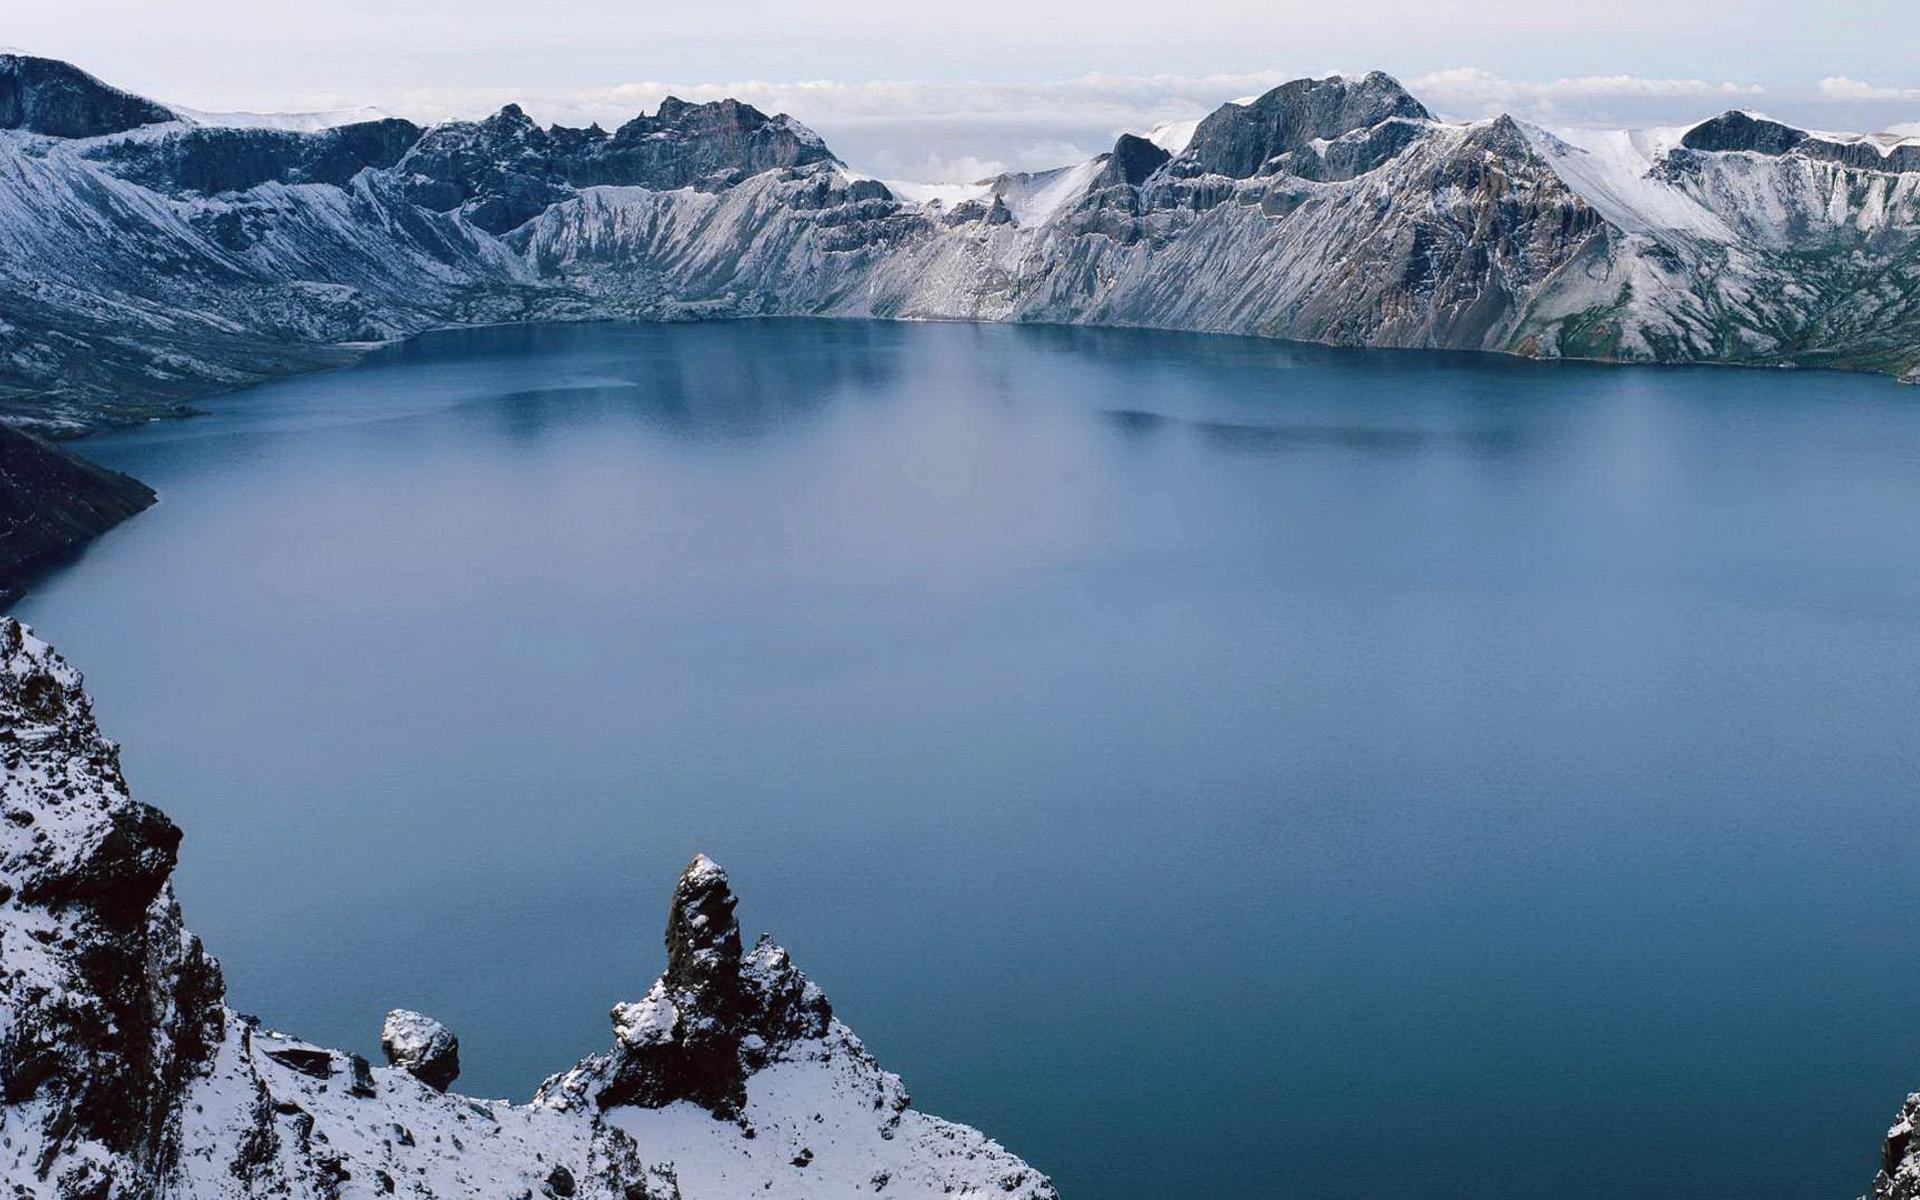 a-lake-among-the-white-mountains_1920x1200.jpg